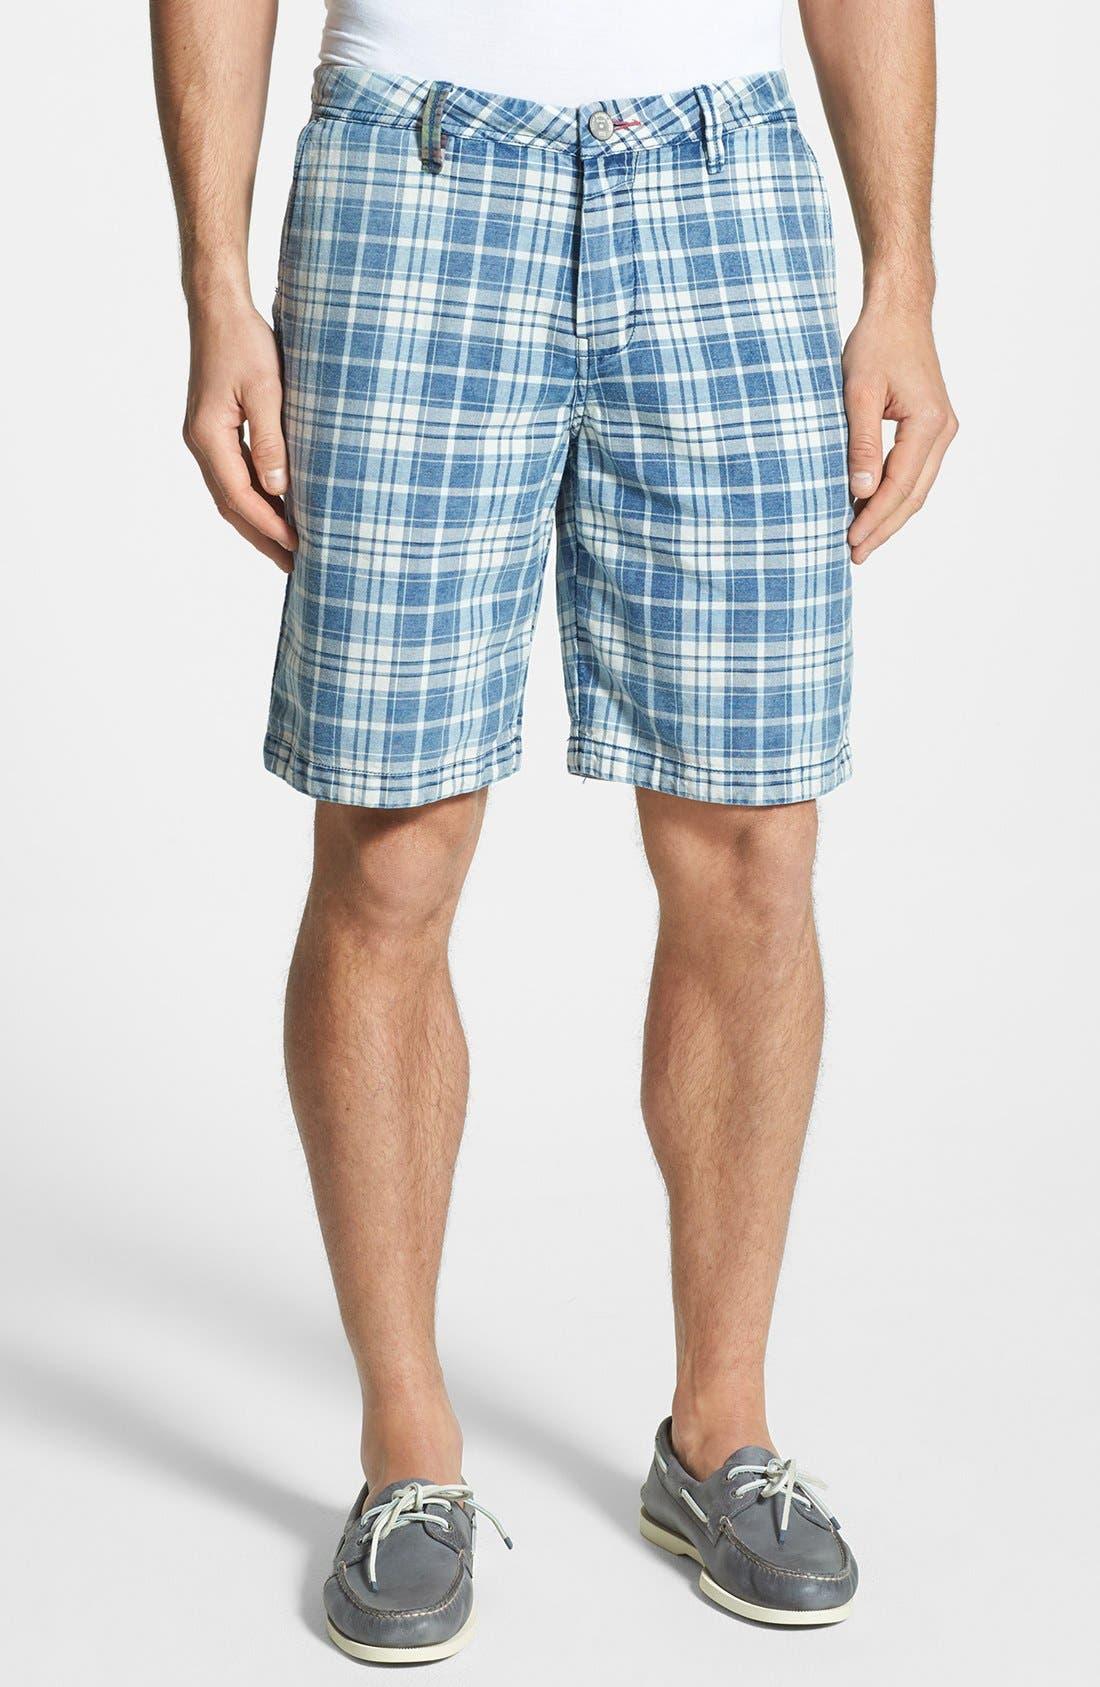 Alternate Image 1 Selected - Tommy Bahama 'Ocean' Shorts